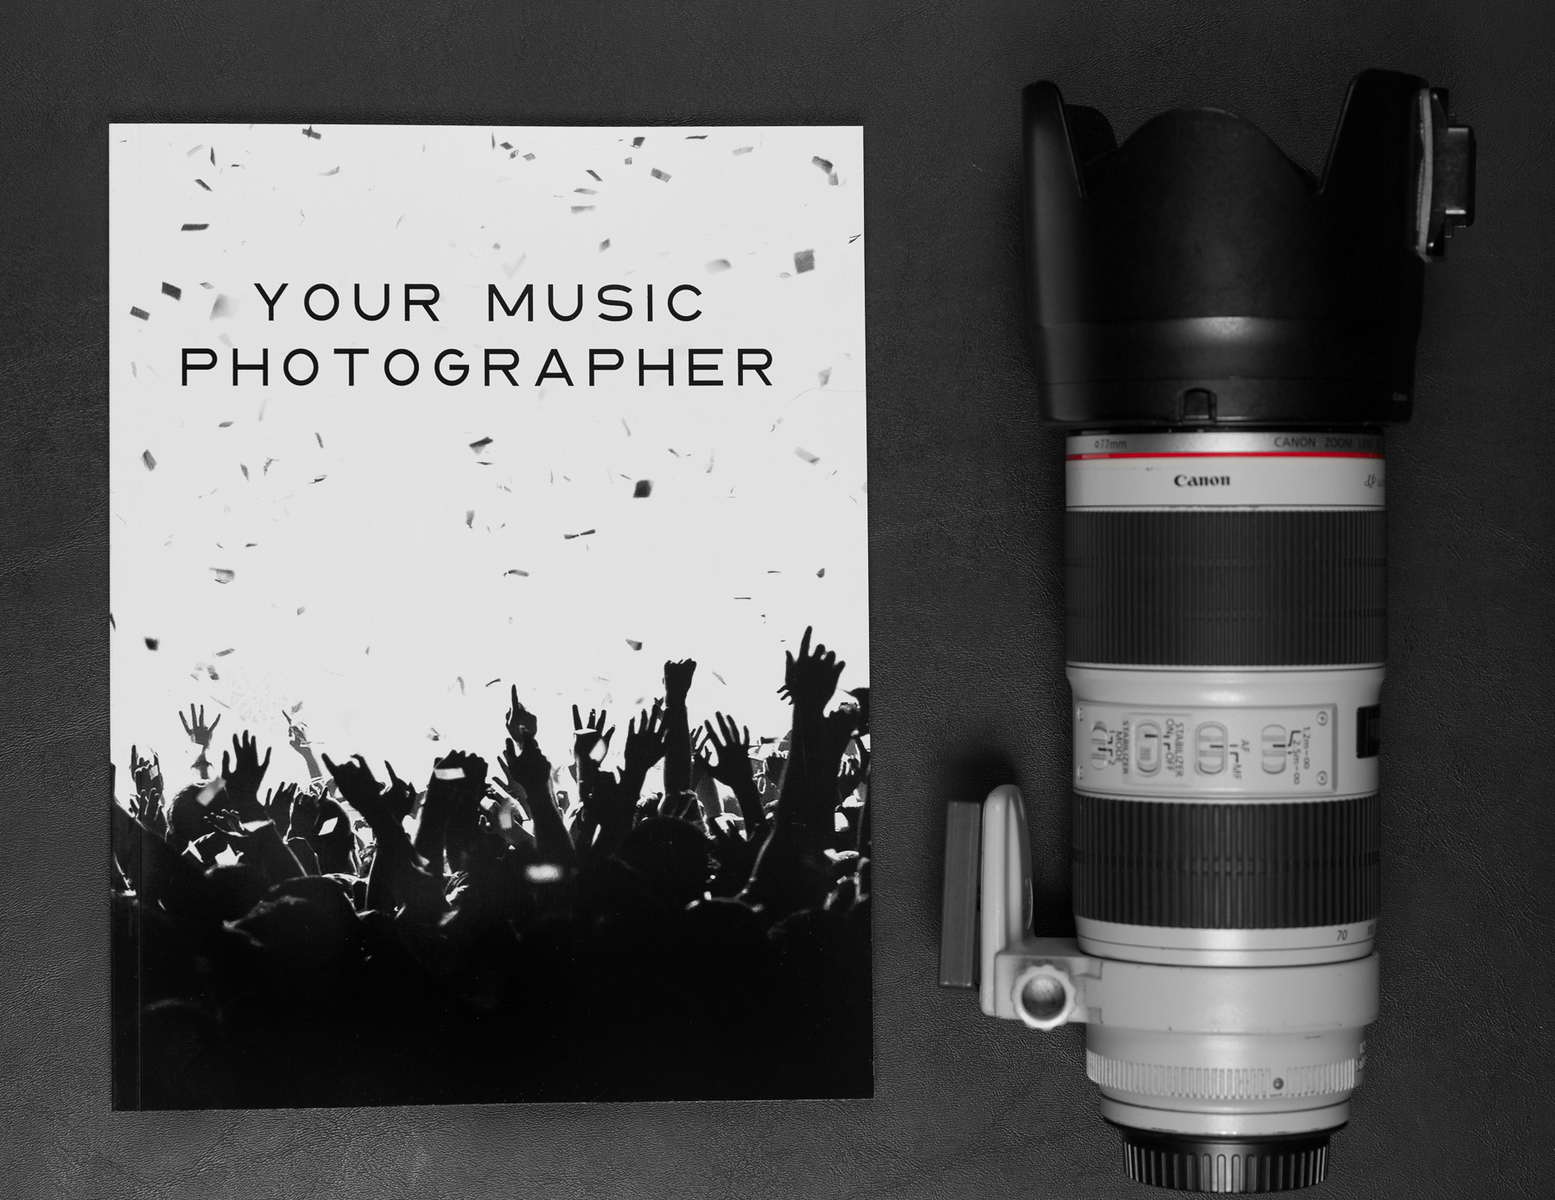 Your Music Photographer Magazine by Adam Elmakias